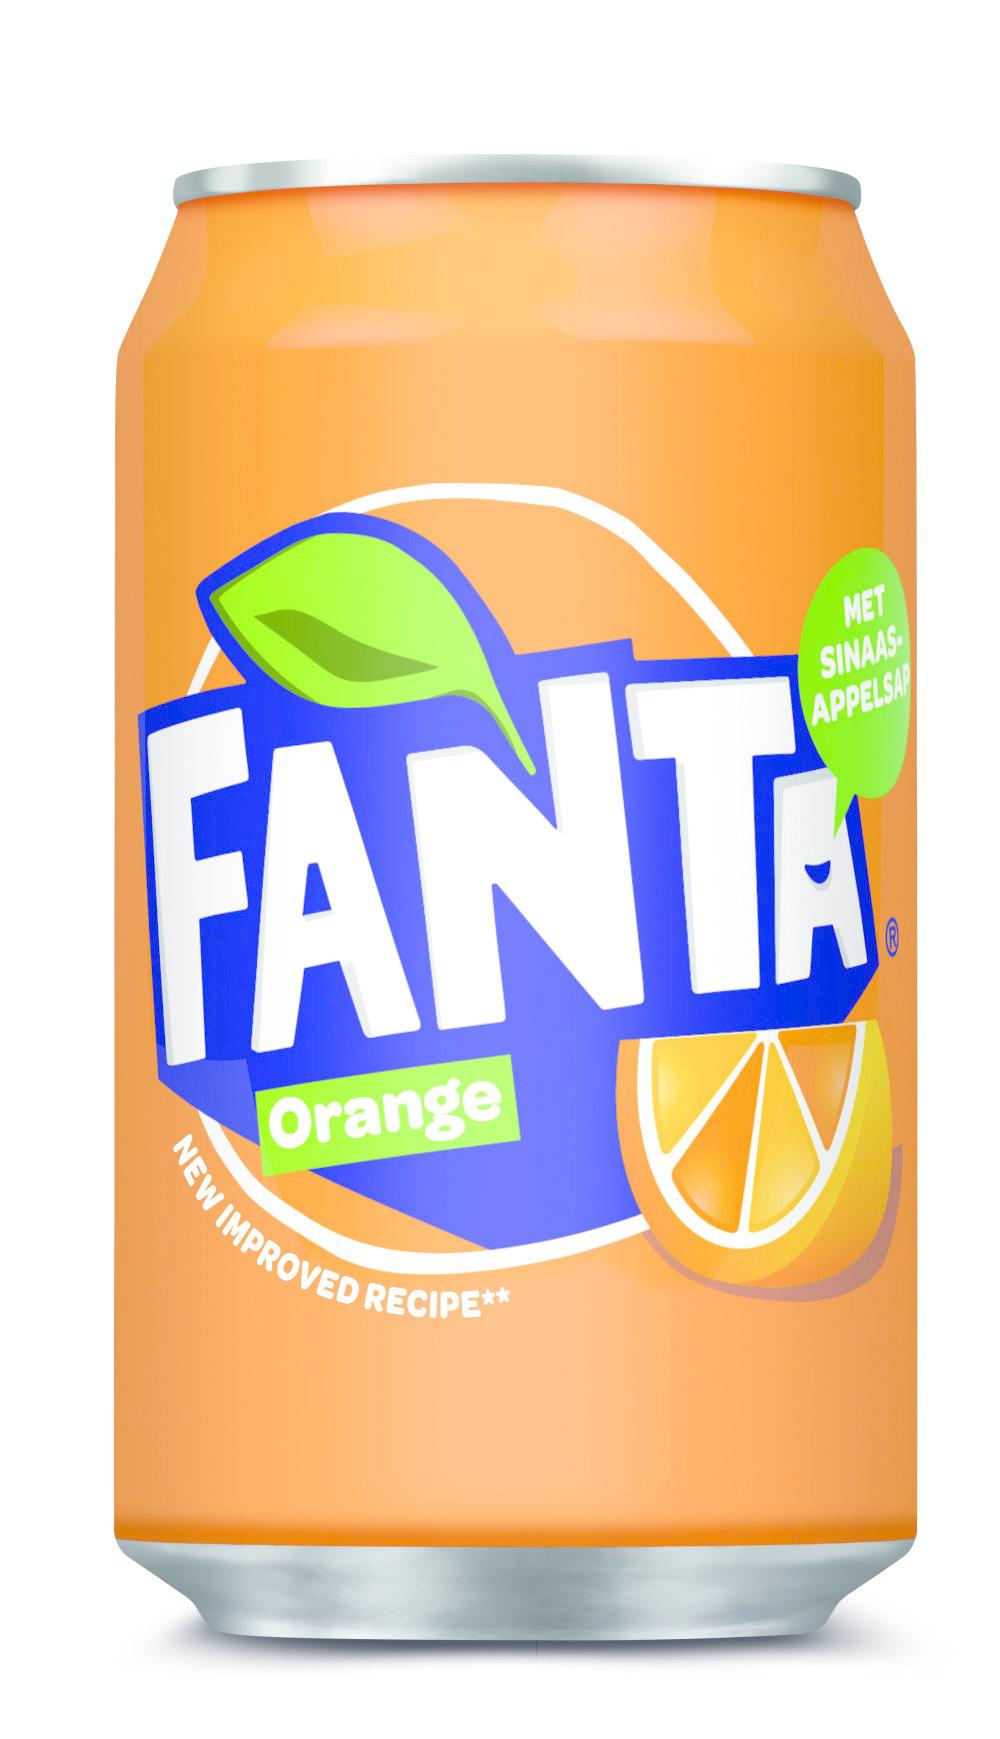 Fanta Fanta - Fanta Orange 33Cl Blik, 24 Blikken